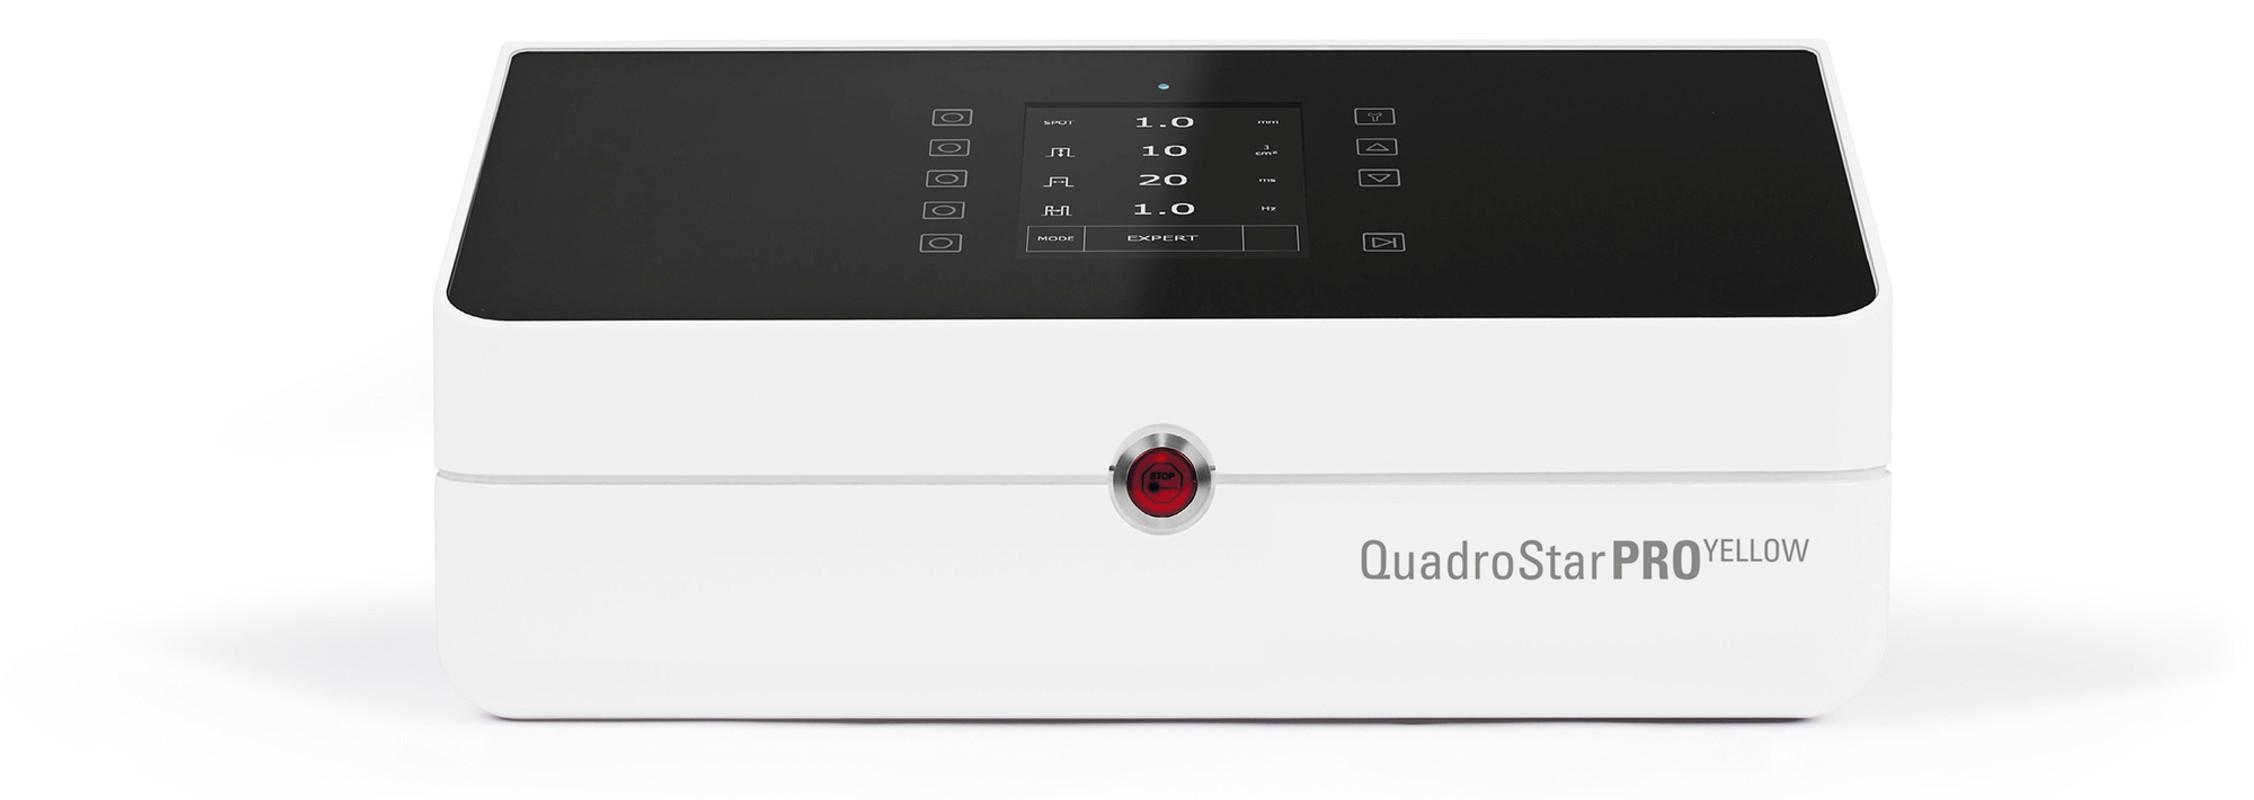 QuadroStarPROyellow front.jpg